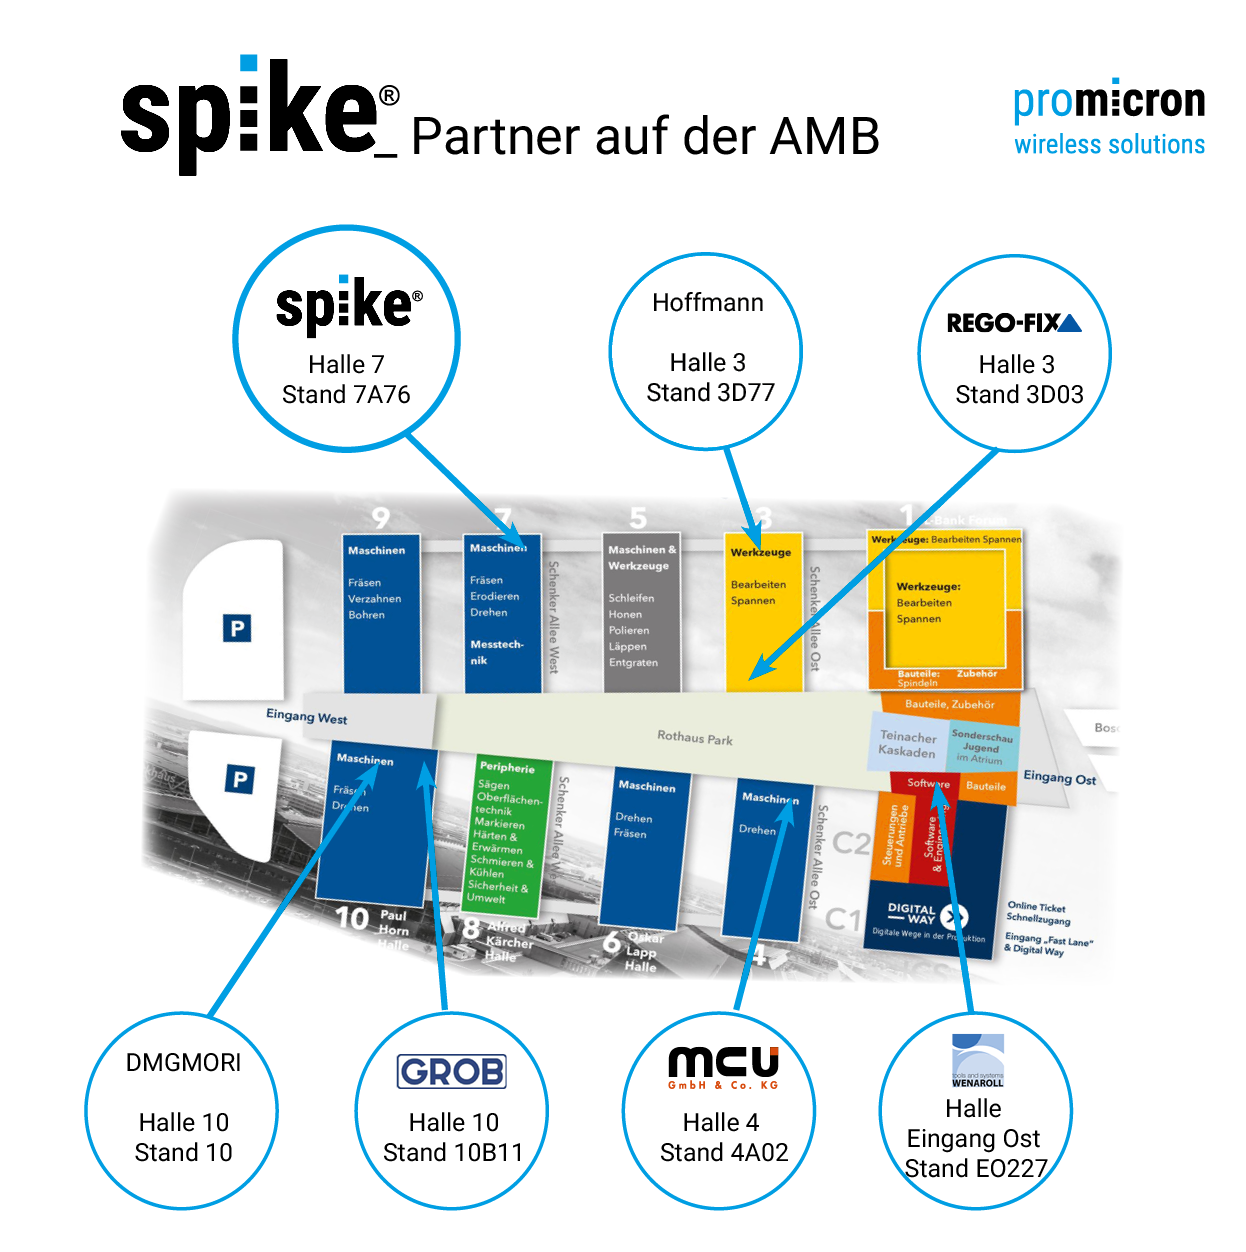 spike®_partner auf der AMB: Hoffmann Group, REGO-FIX, Wenaroll, DMGMORI, GROB, MCU